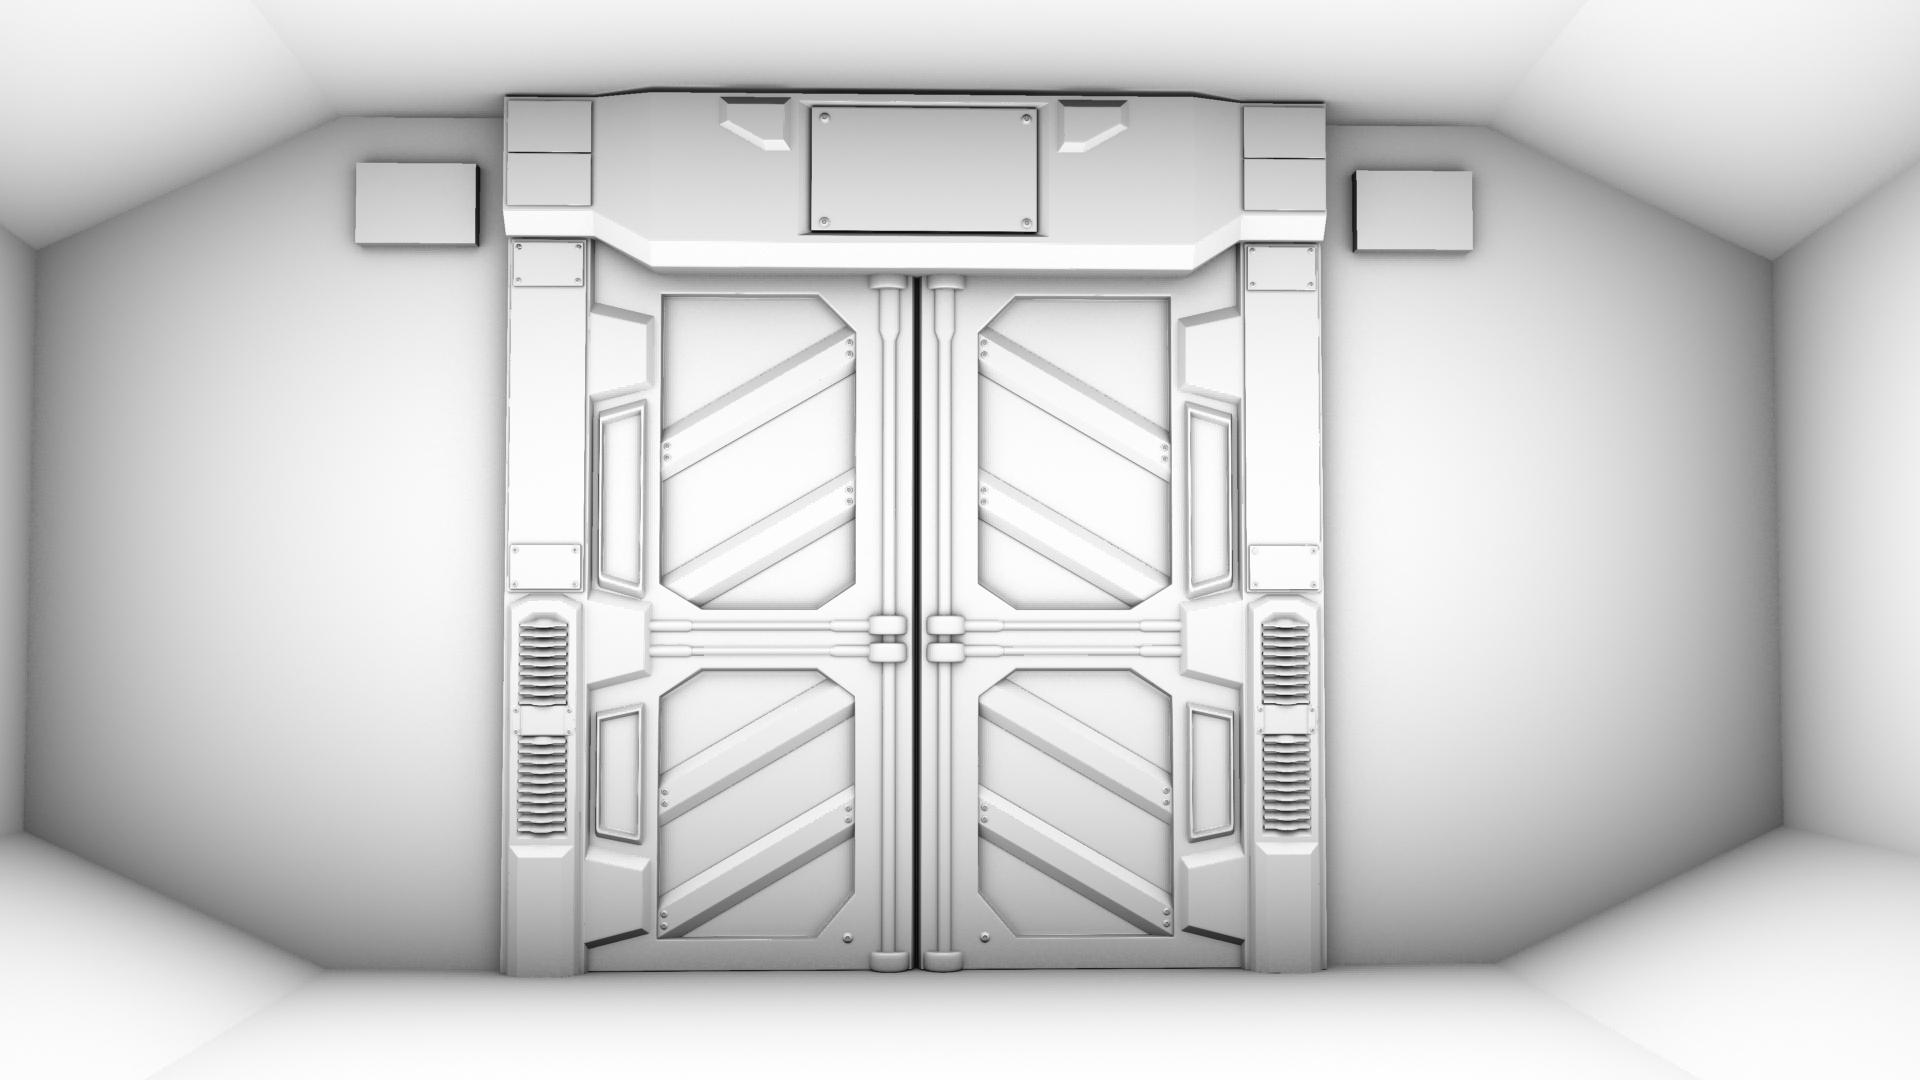 Sci-Fi Door by GladiusM on DeviantArt